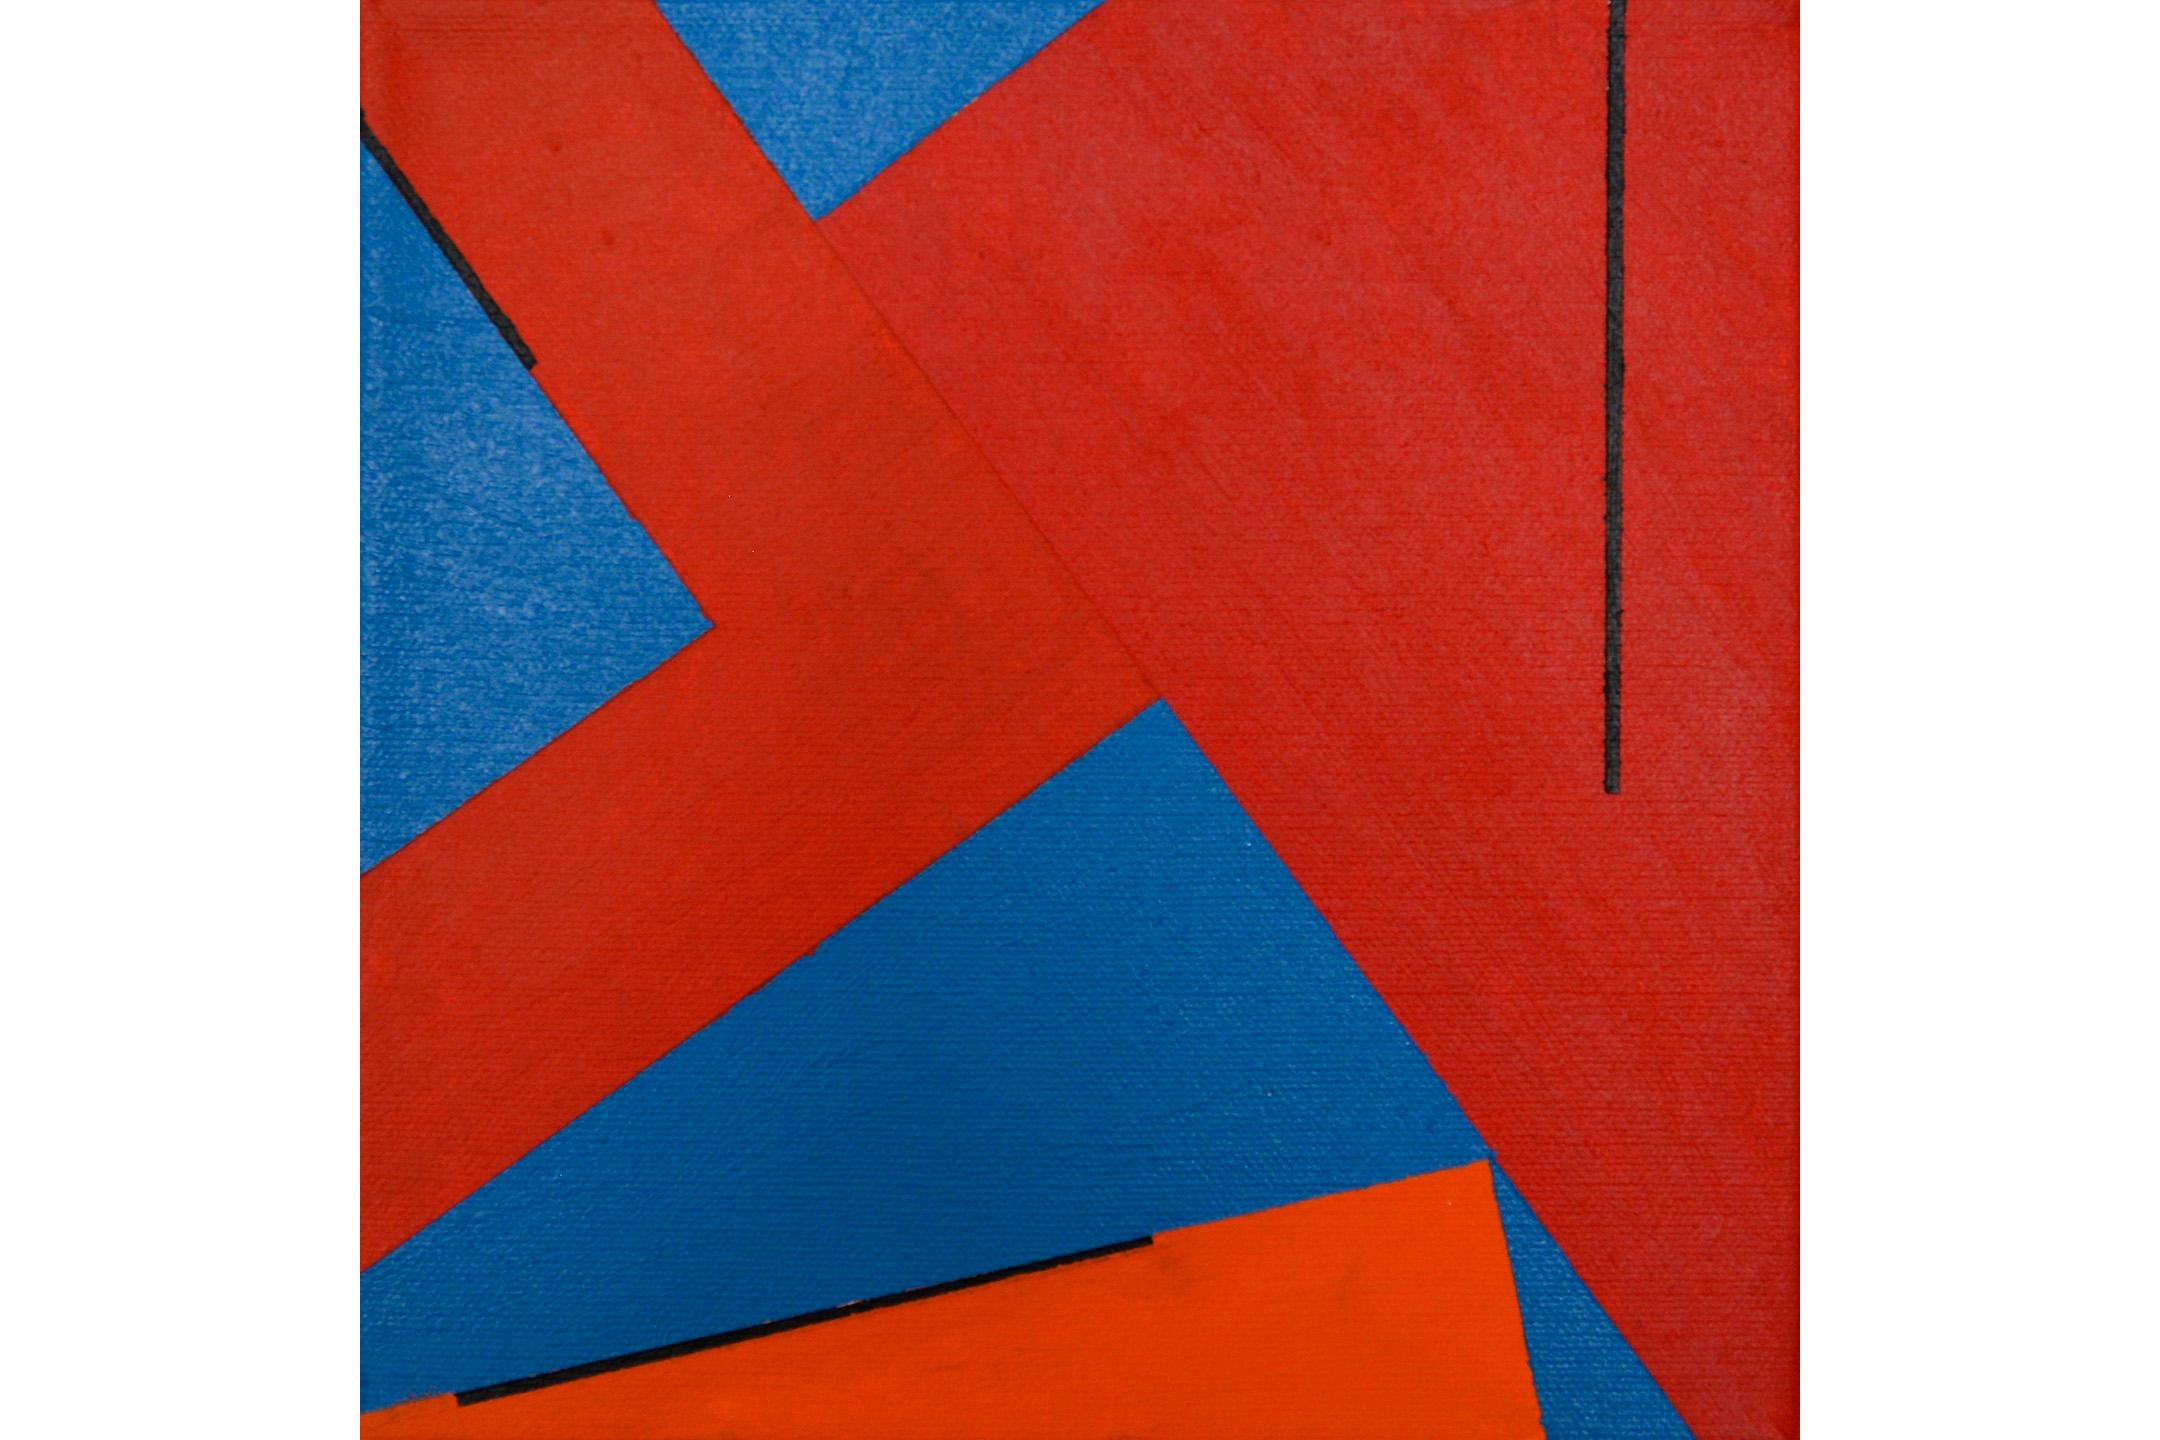 "Solomon Ethe, Untitled, Acrylic on canvas, 8"" x 8"", 2016"